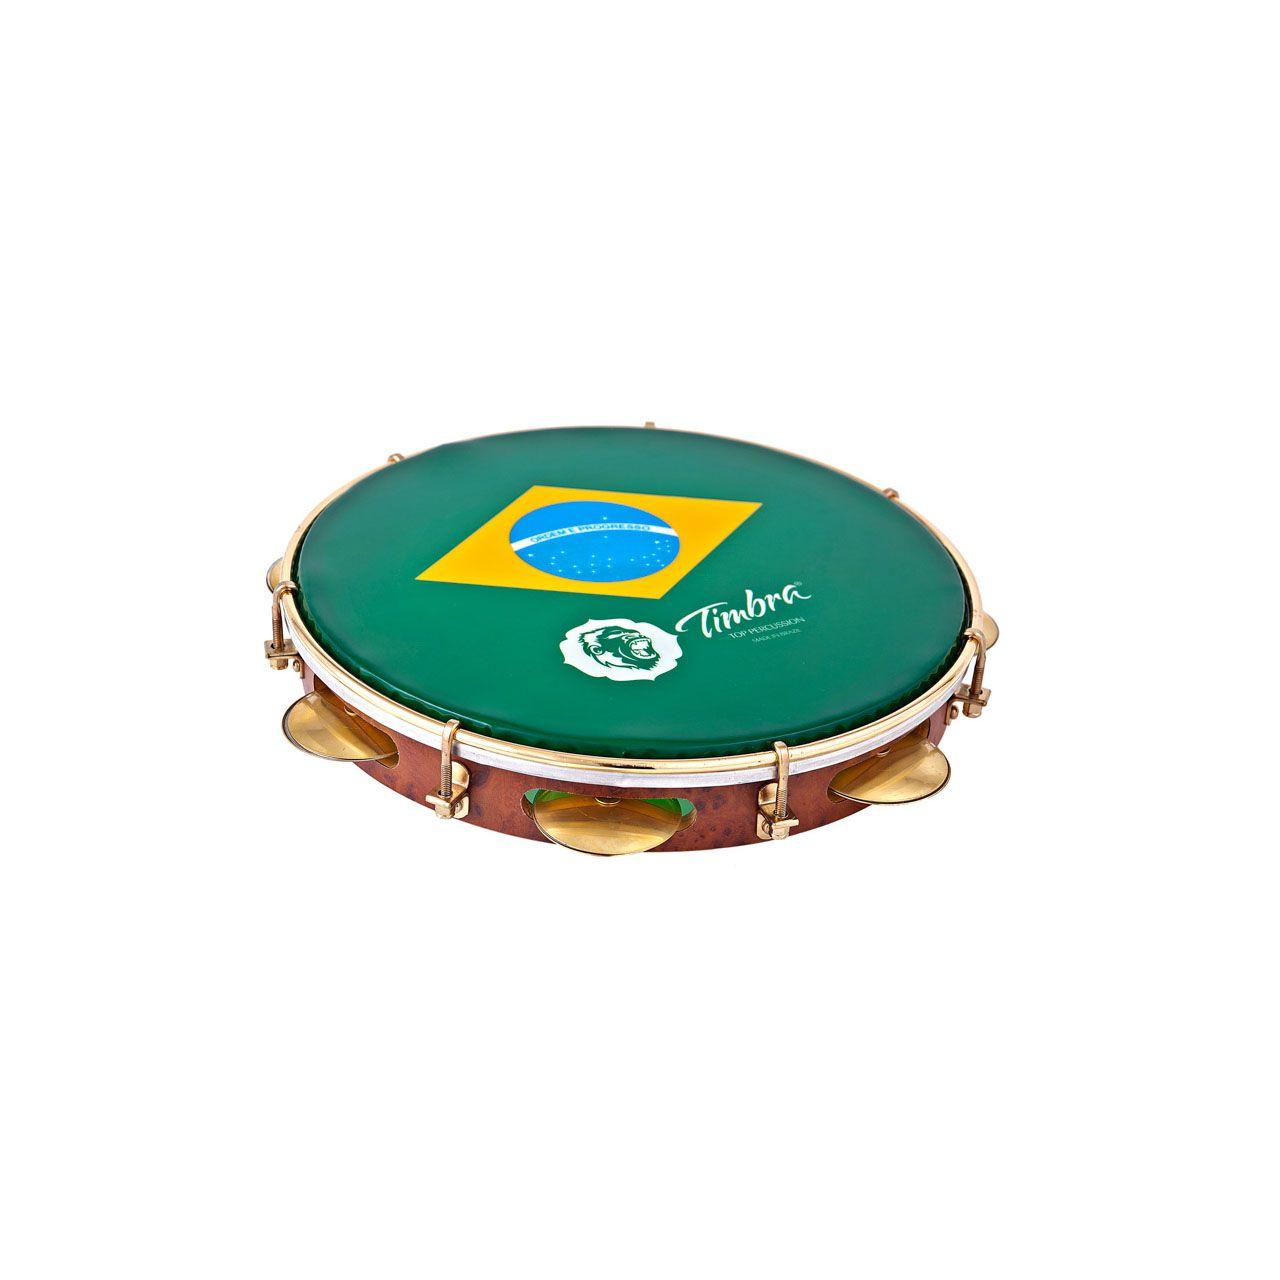 Pandeiro 10 Pol Formica C/aro Dourado   Pele Brasil C/capa Timbra